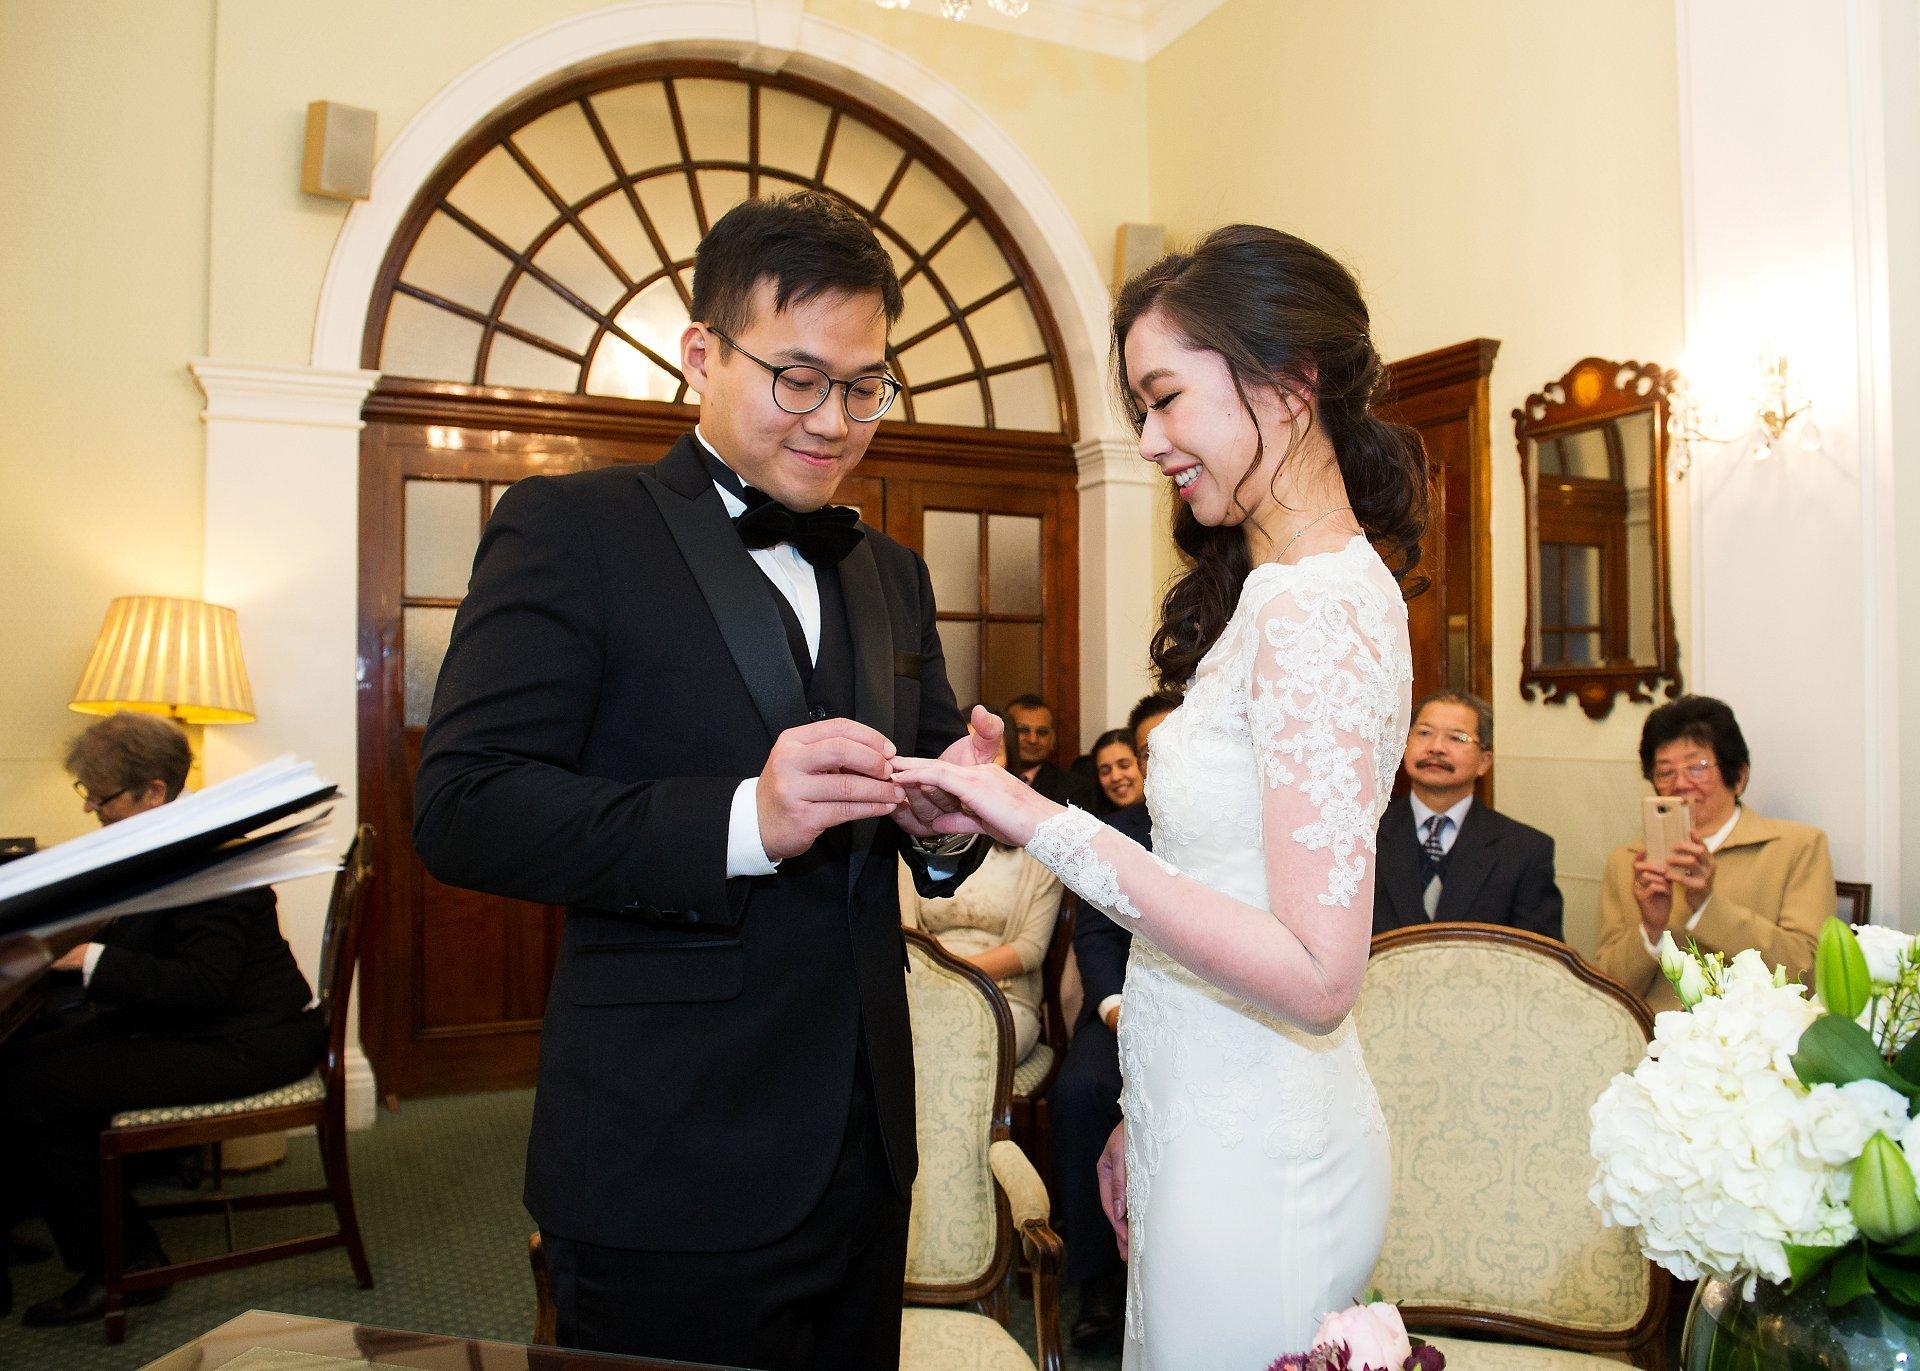 Rossetti Room Christmas wedding groom places ring on bride's finger